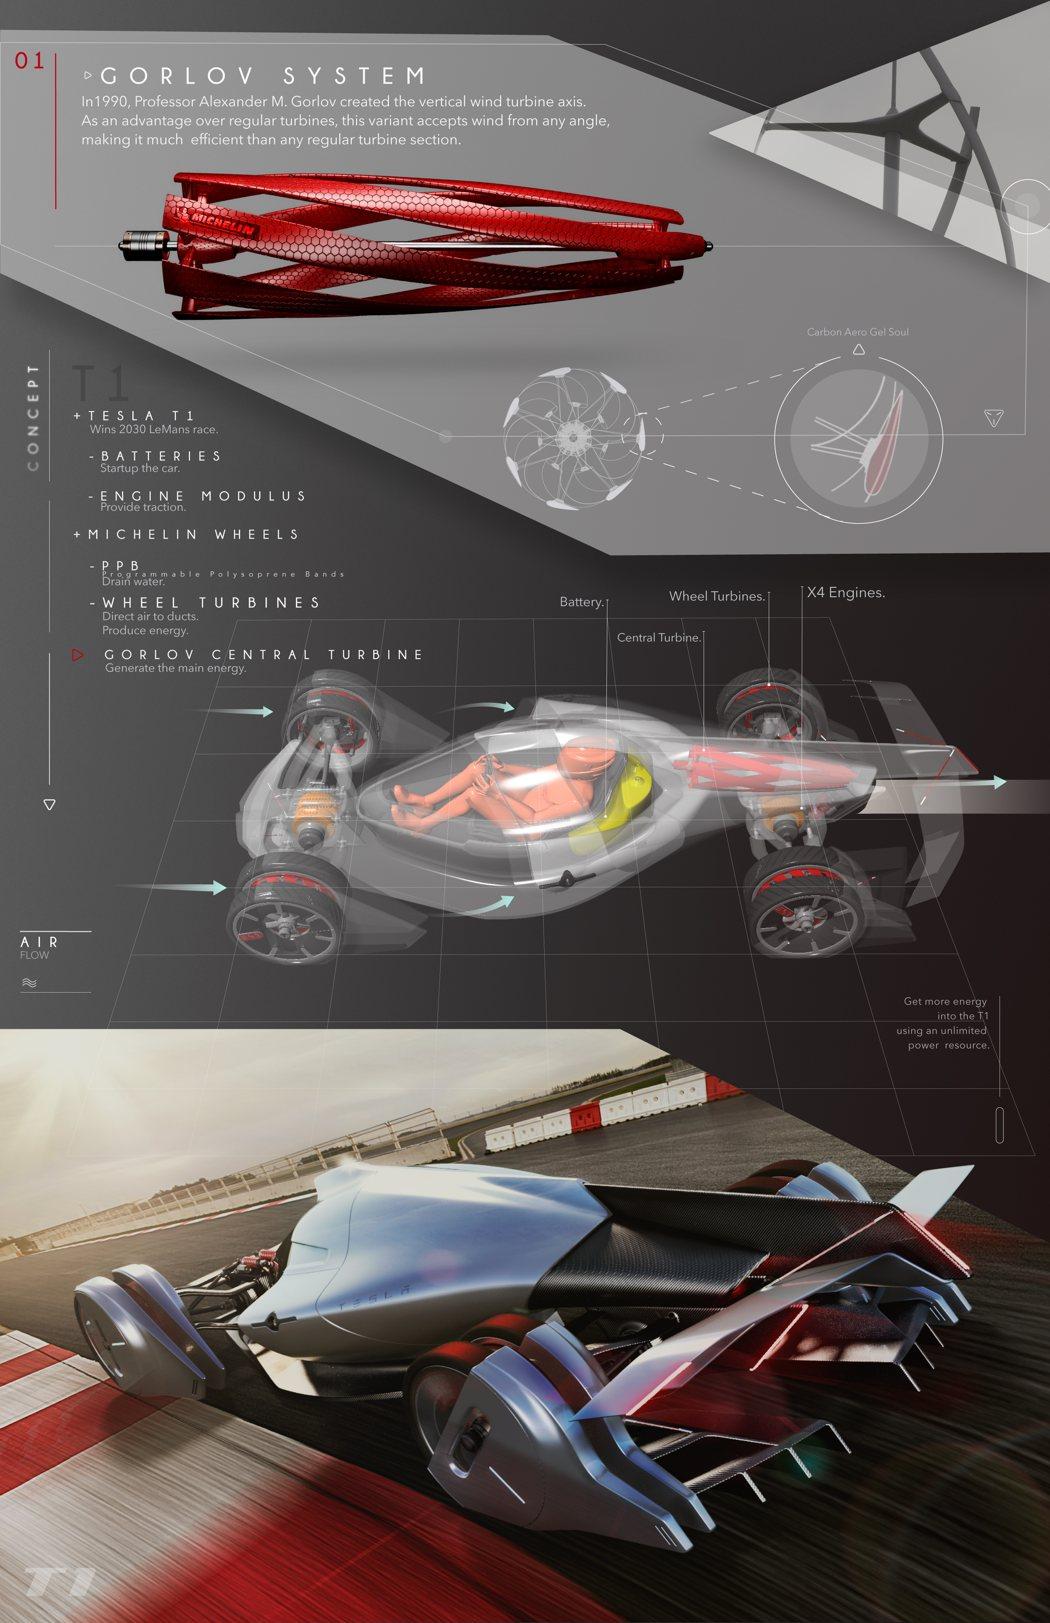 A 4 Turbine Tesla